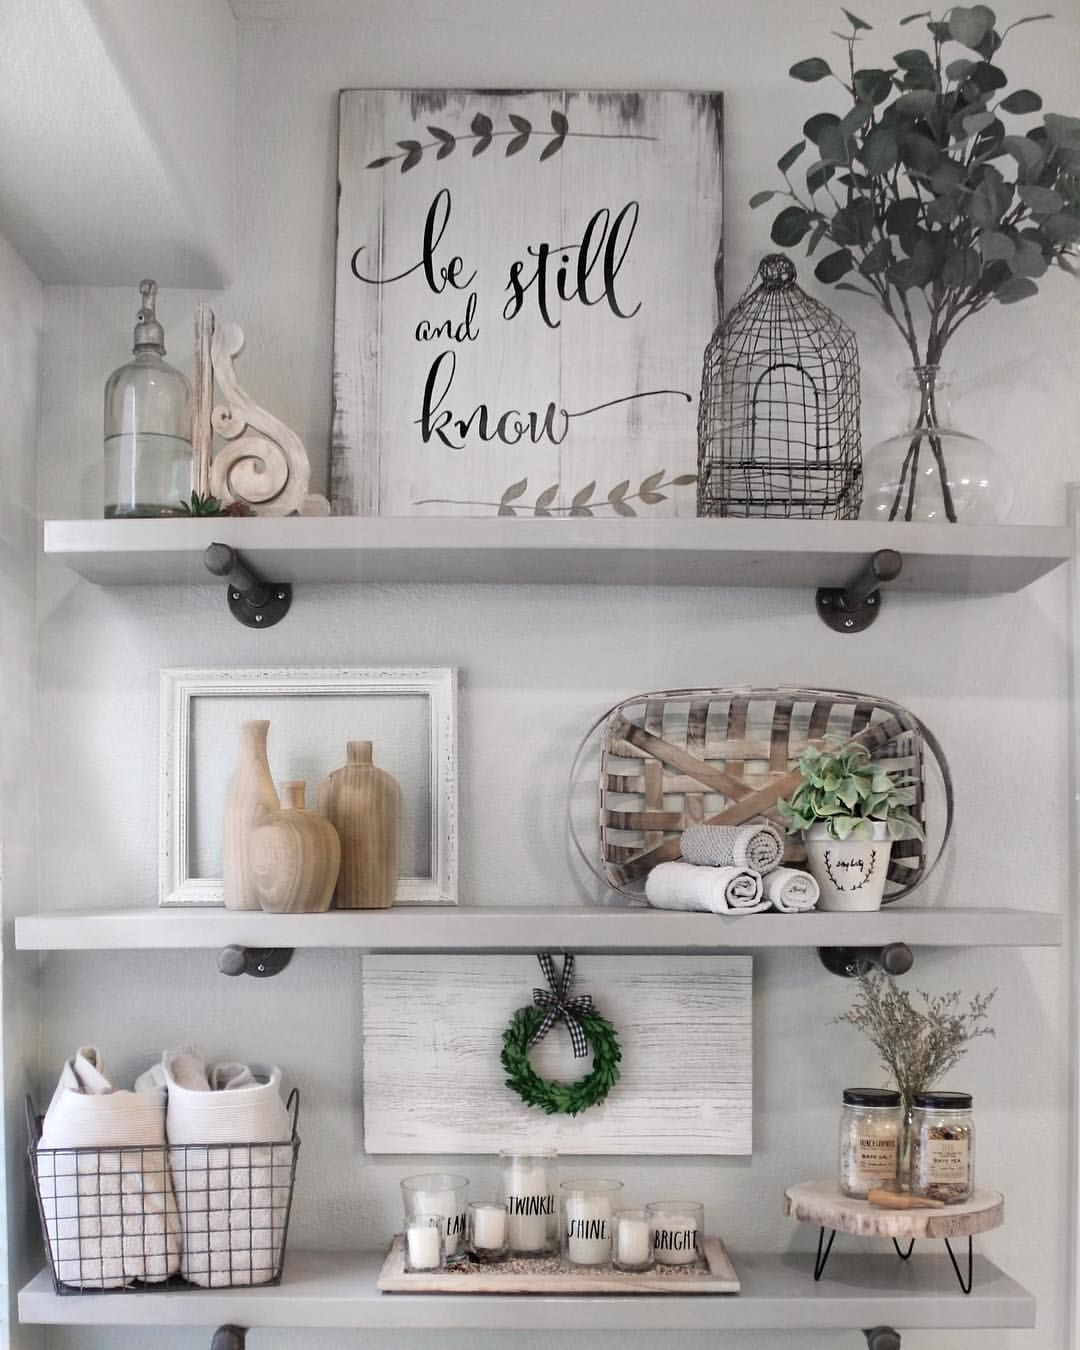 How to style bathroom shelves. Farmhouse shelf decor. DIY